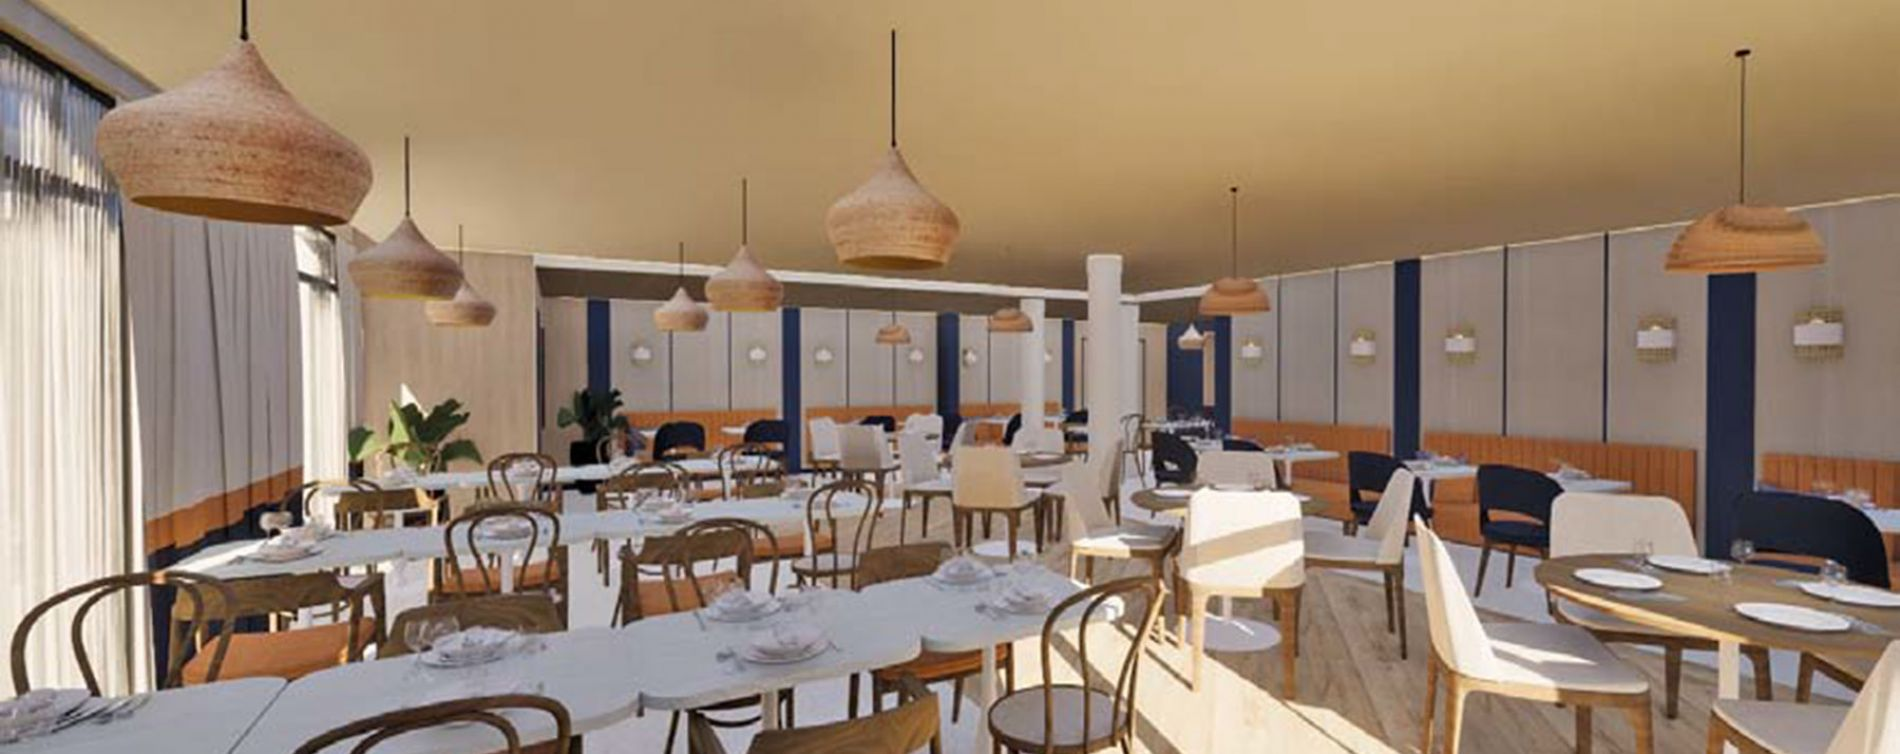 Fréjus : programme immobilier neuve « Les Balcons de la Villa Marina » (5)